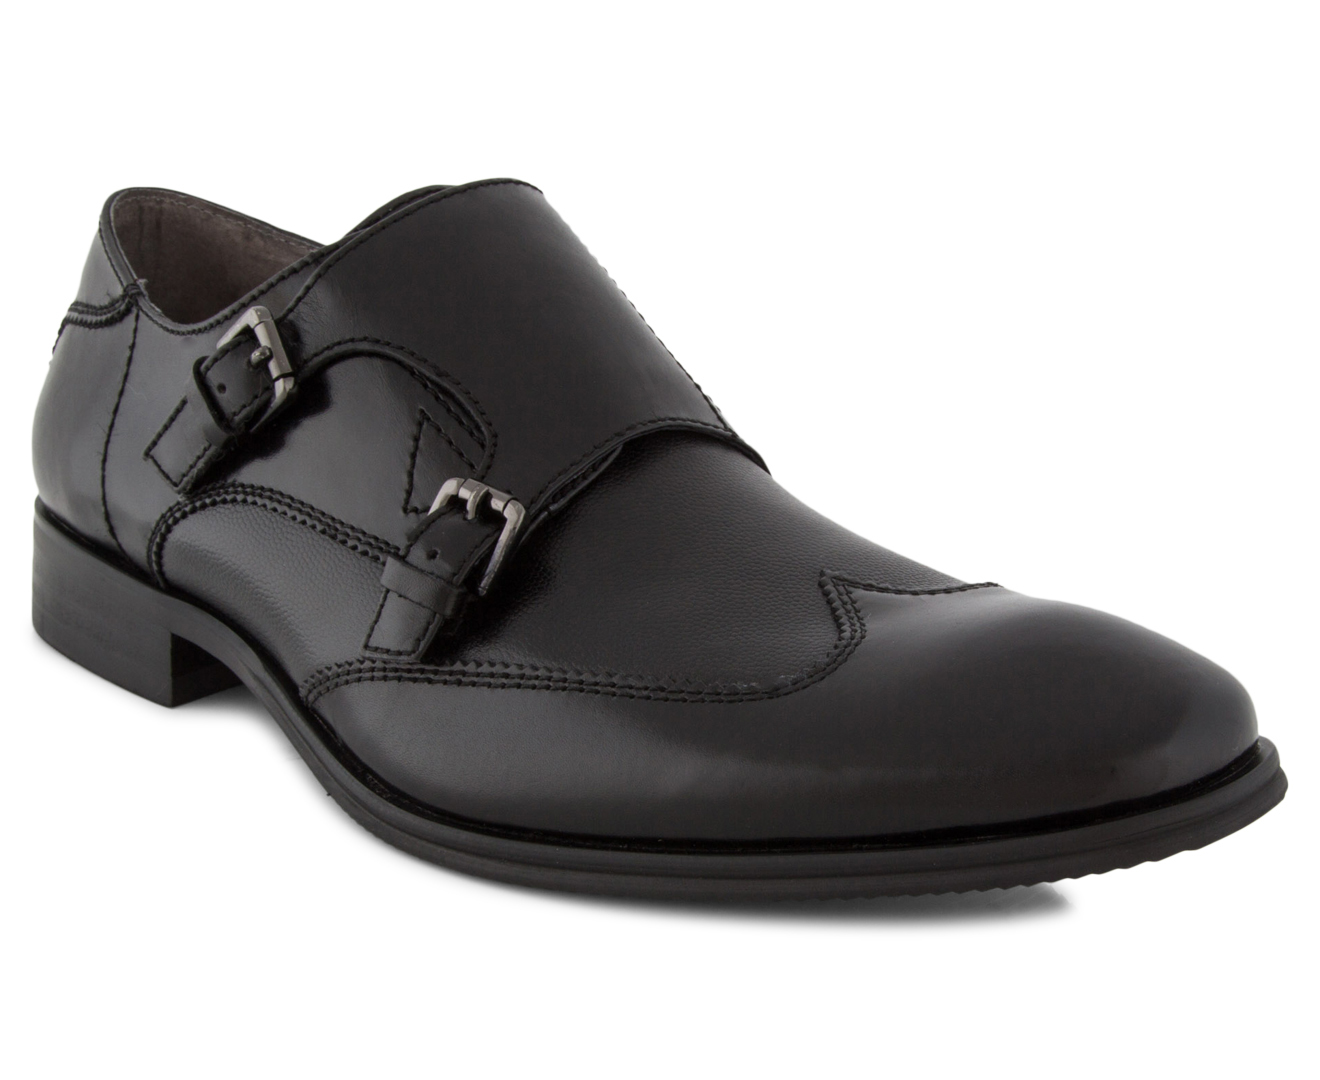 Julius Marlow Shoes Online